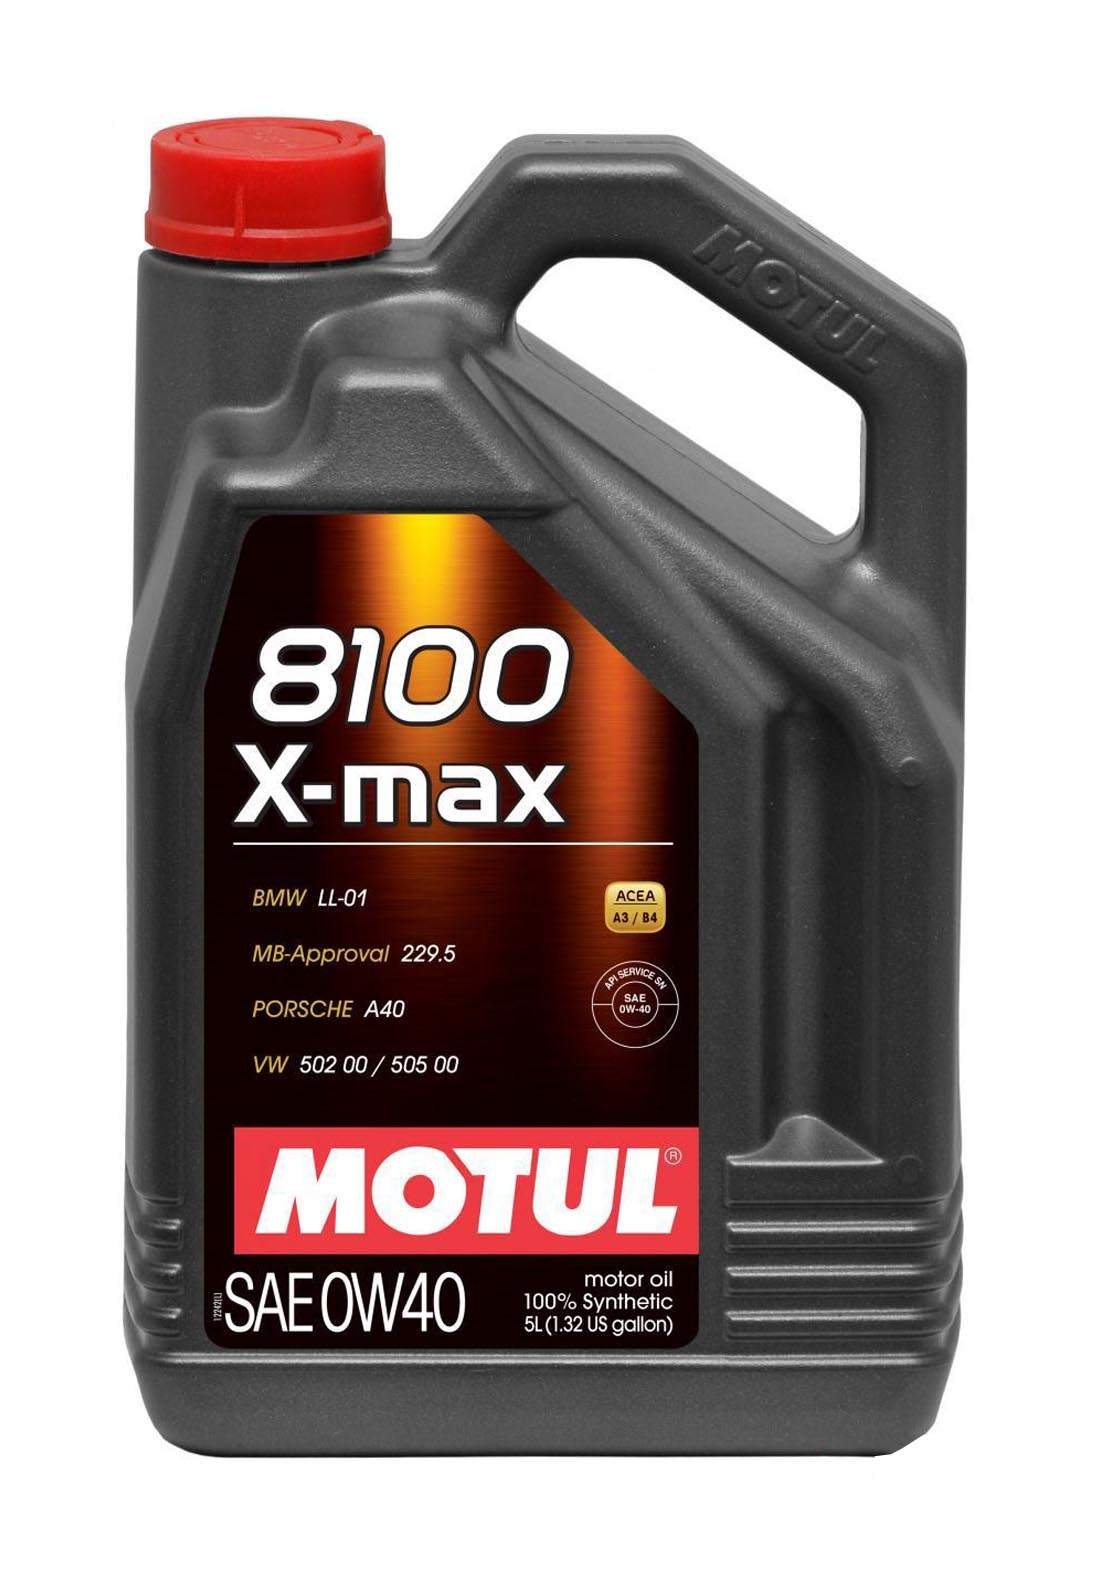 Motul 0w40 Xmax 8100 100% Synthetic oil 4L  زيت تخليقي 100% للسيارات